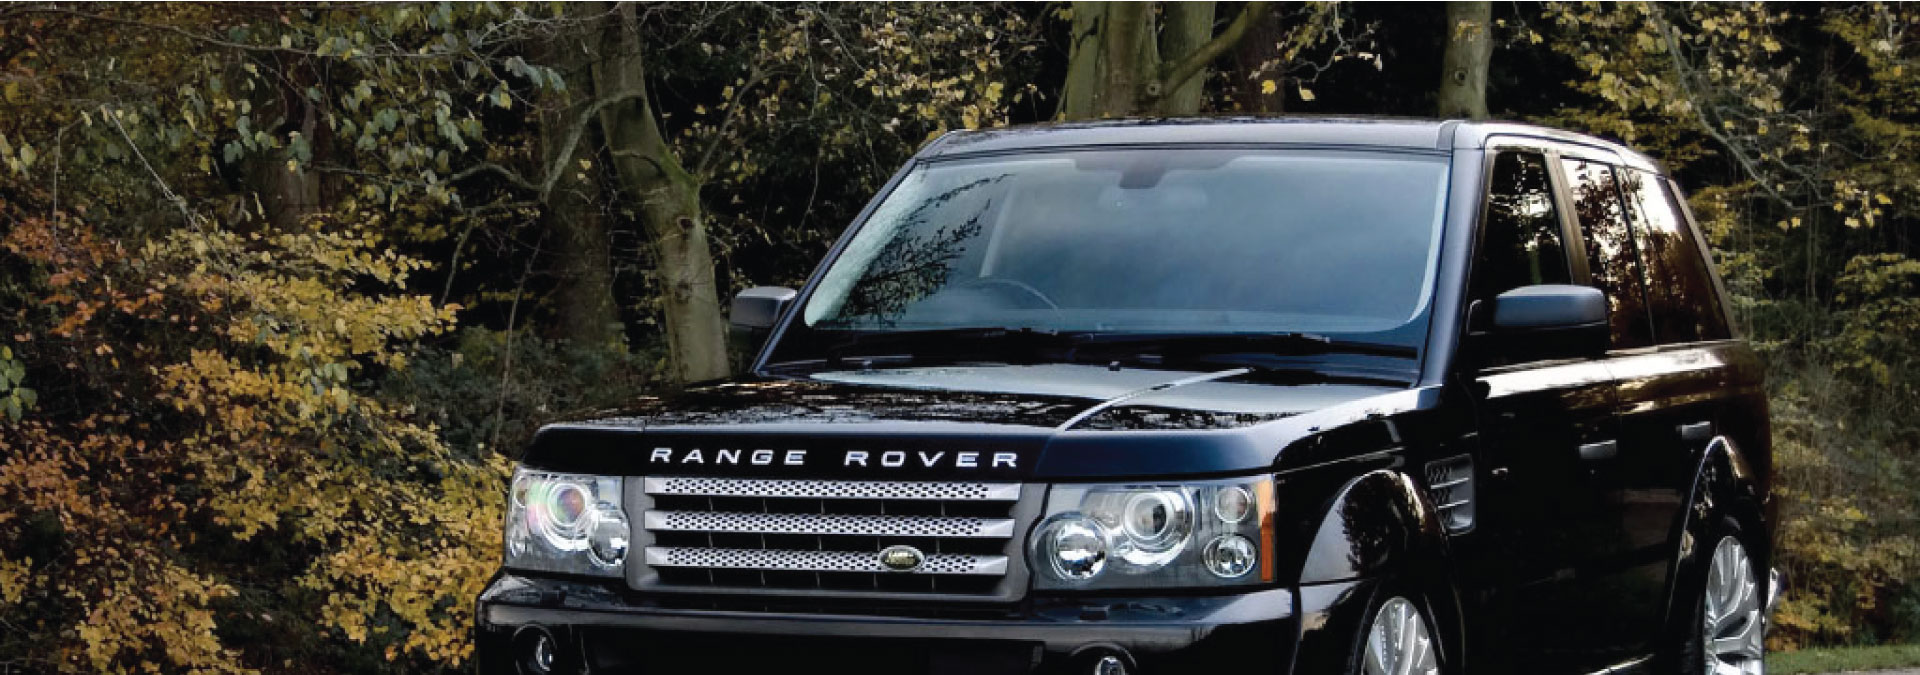 Land Rover | ECU Tuning Group Toronto